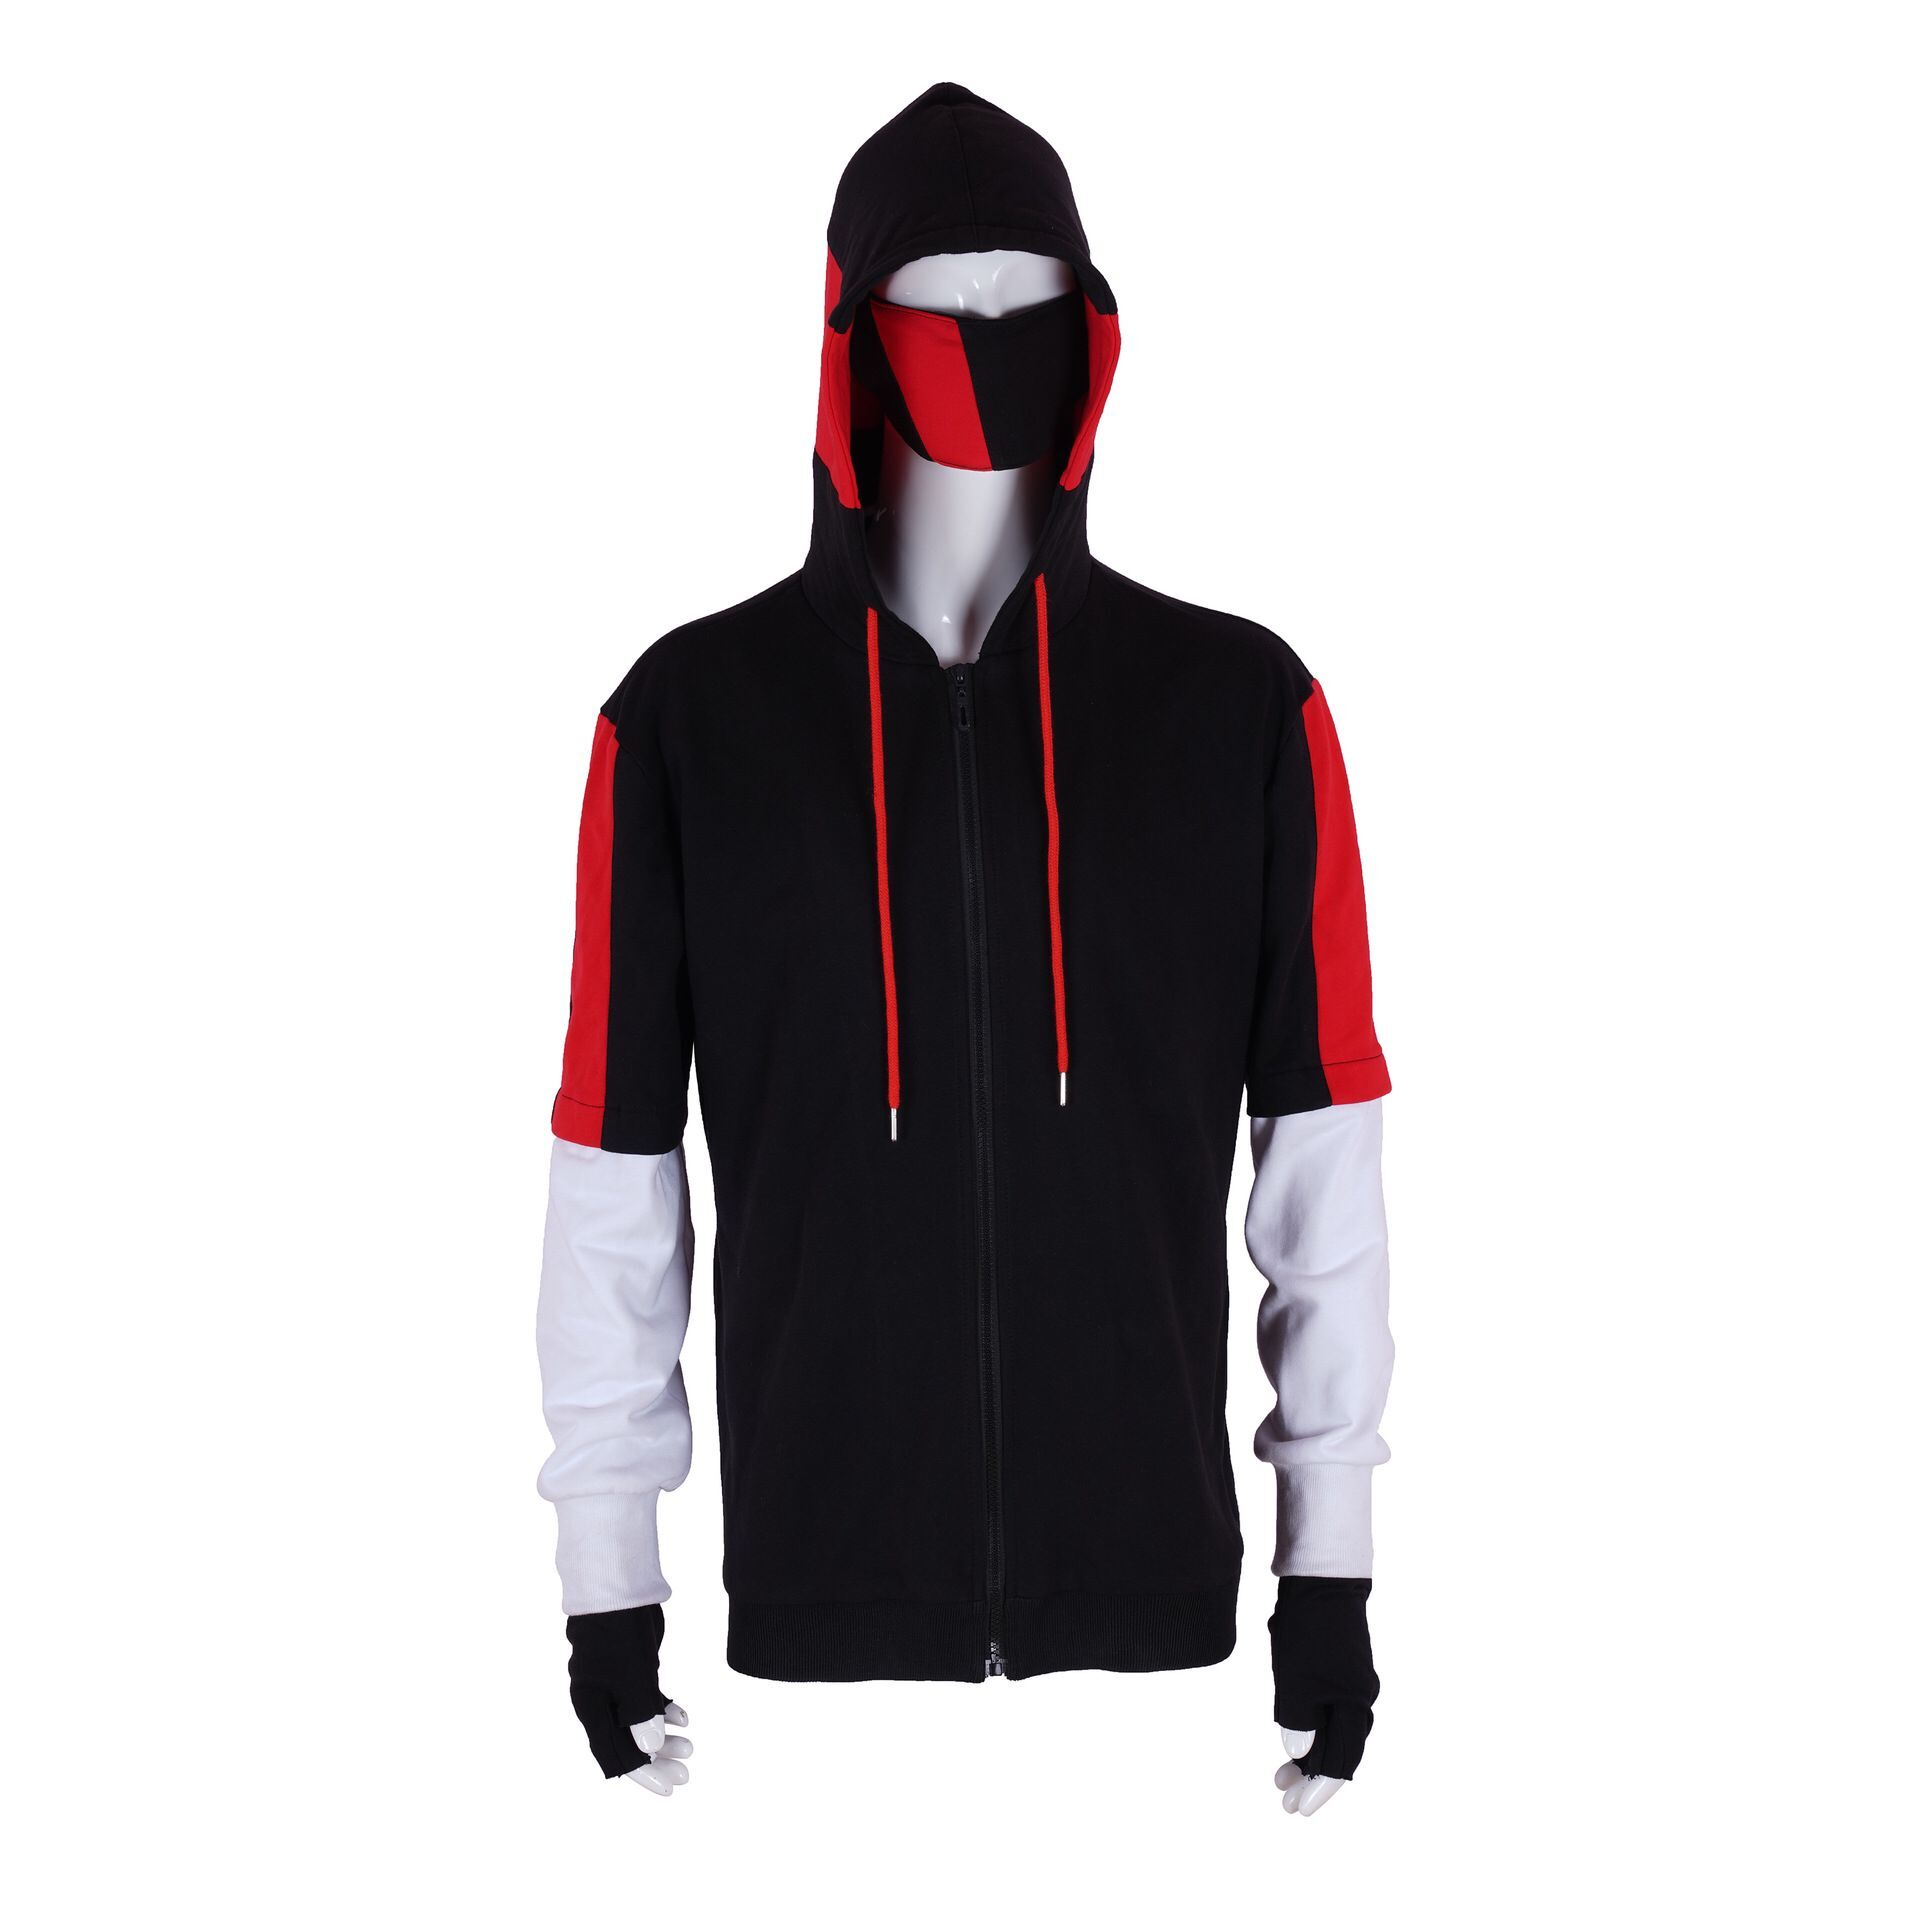 Jogo ikonik pele cosplay traje hoodies com zíper jaqueta máscara luva define traje de halloween